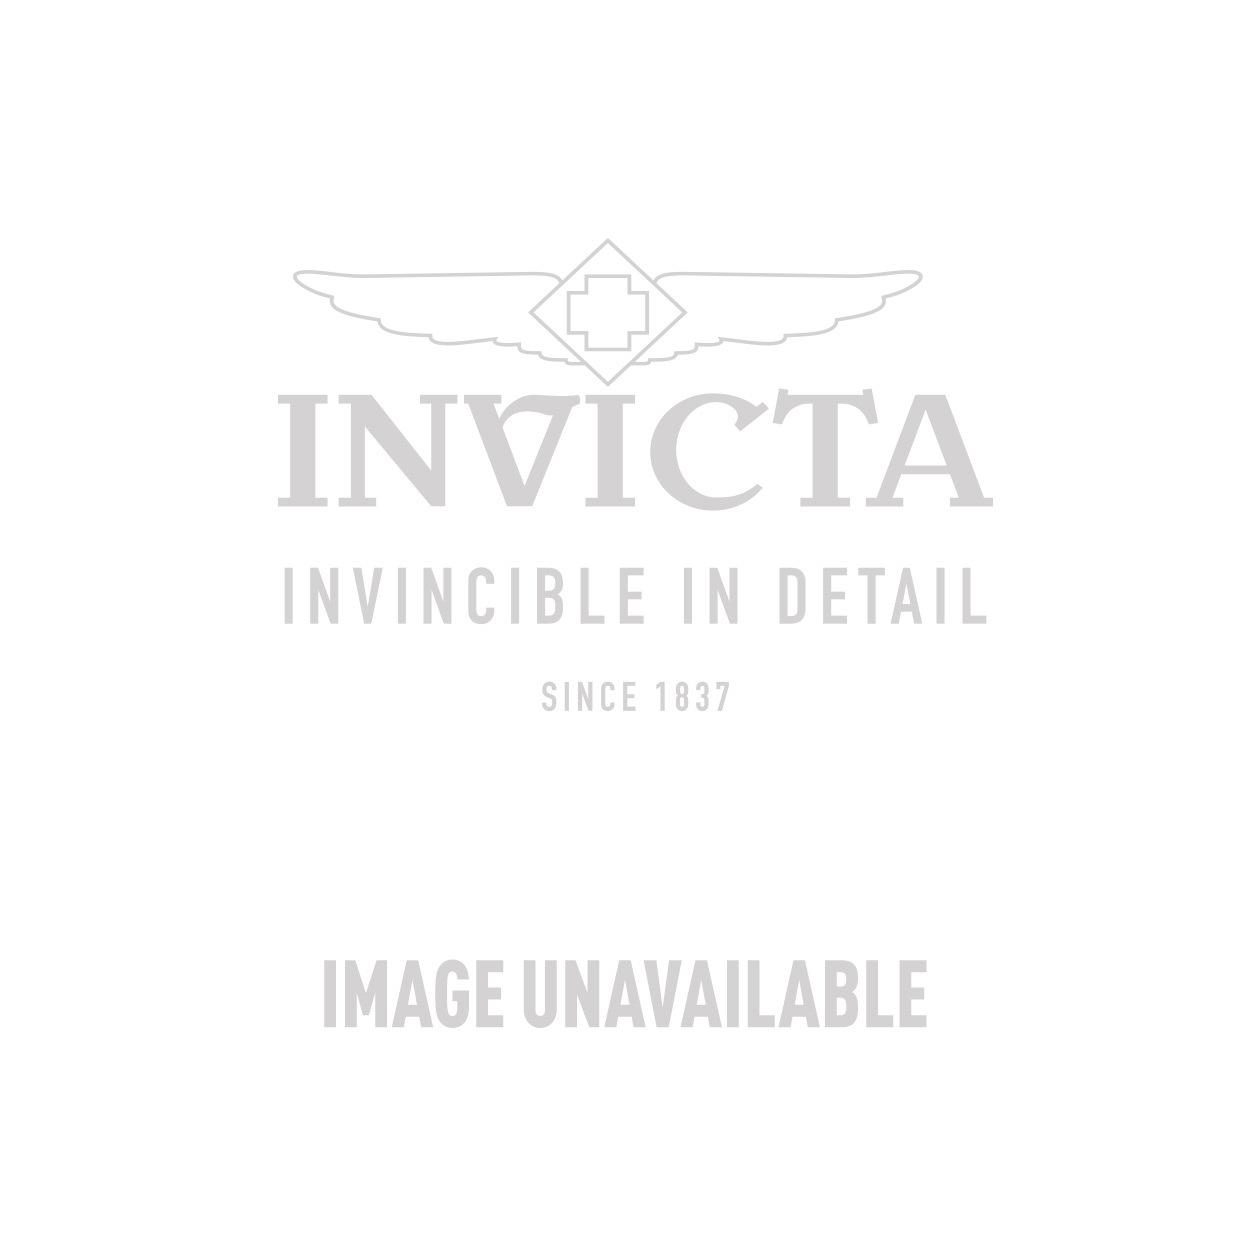 Invicta Corduba Swiss Made Quartz Watch - Stainless Steel case with Black tone Polyurethane band - Model 90226